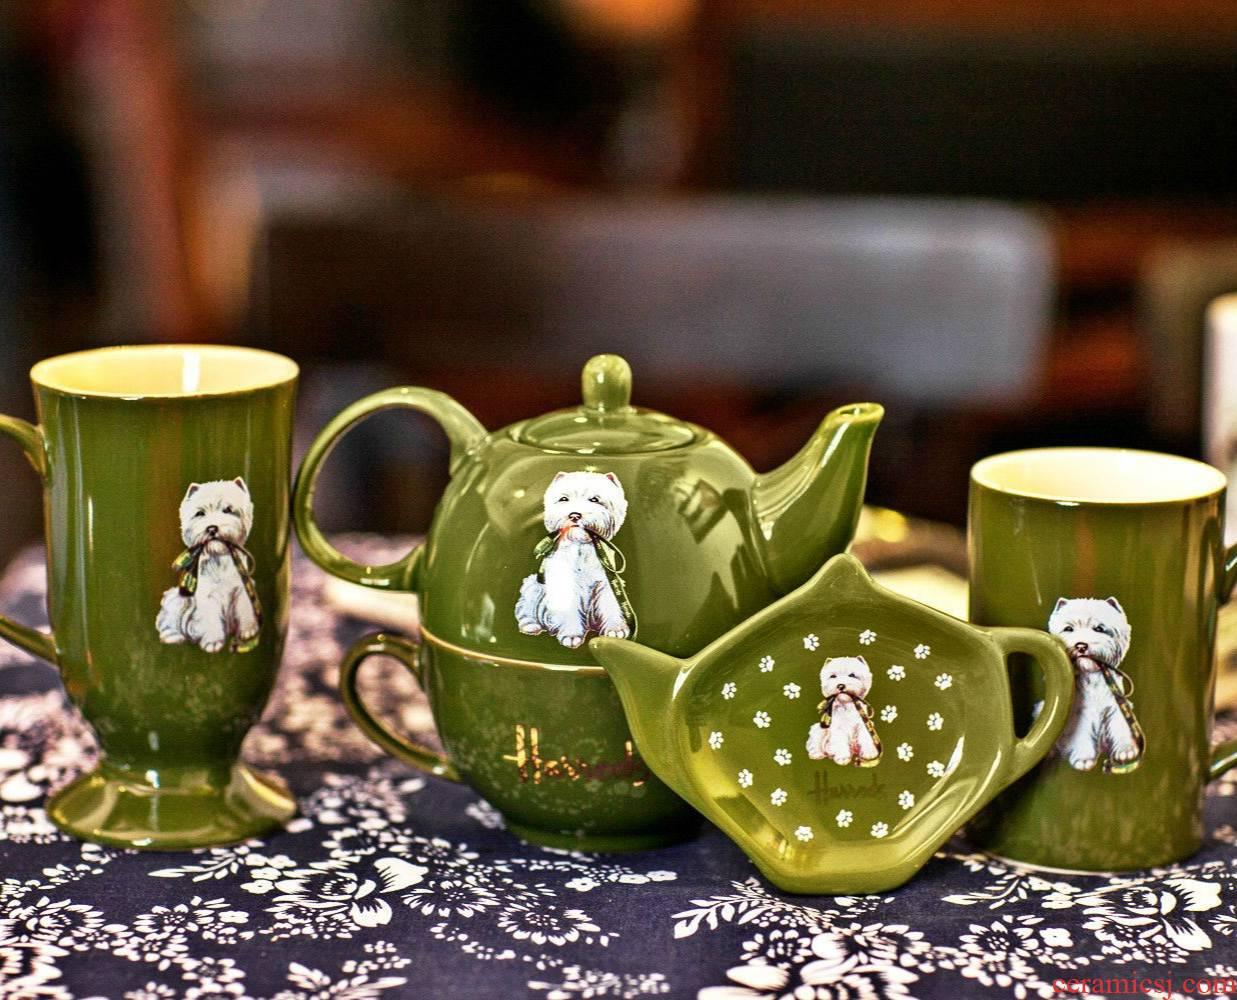 The harrods harrods ceramic cup mark cup couples cup teapot tea saucer west highland disc set